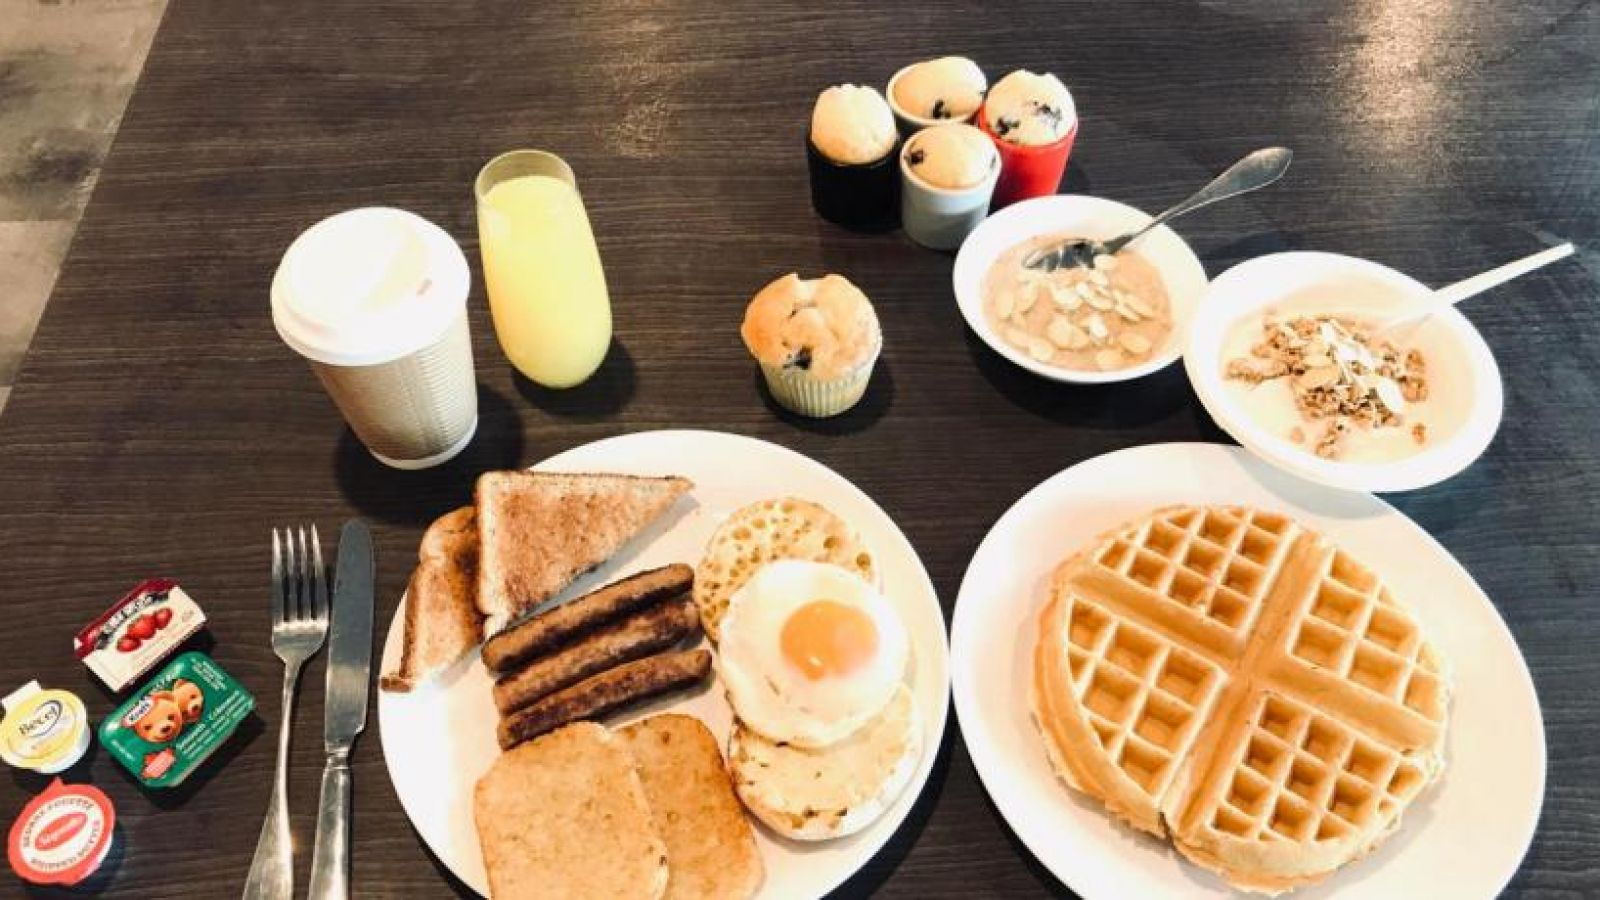 The Hue Hotel, free breakfast